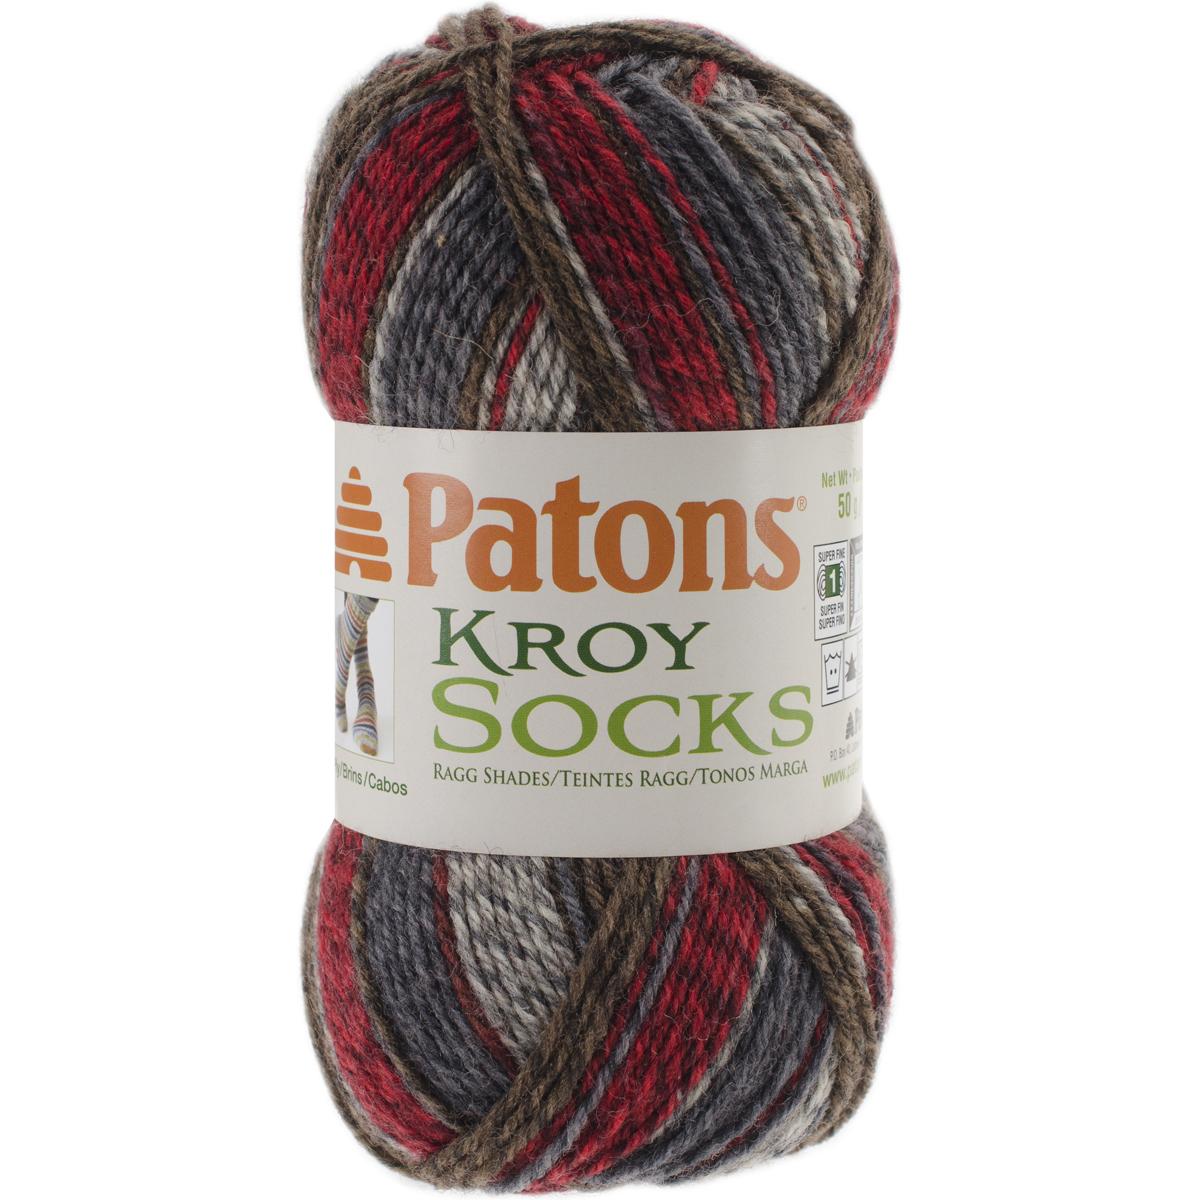 Kroy Socks Yarn-Grey Brown Marl